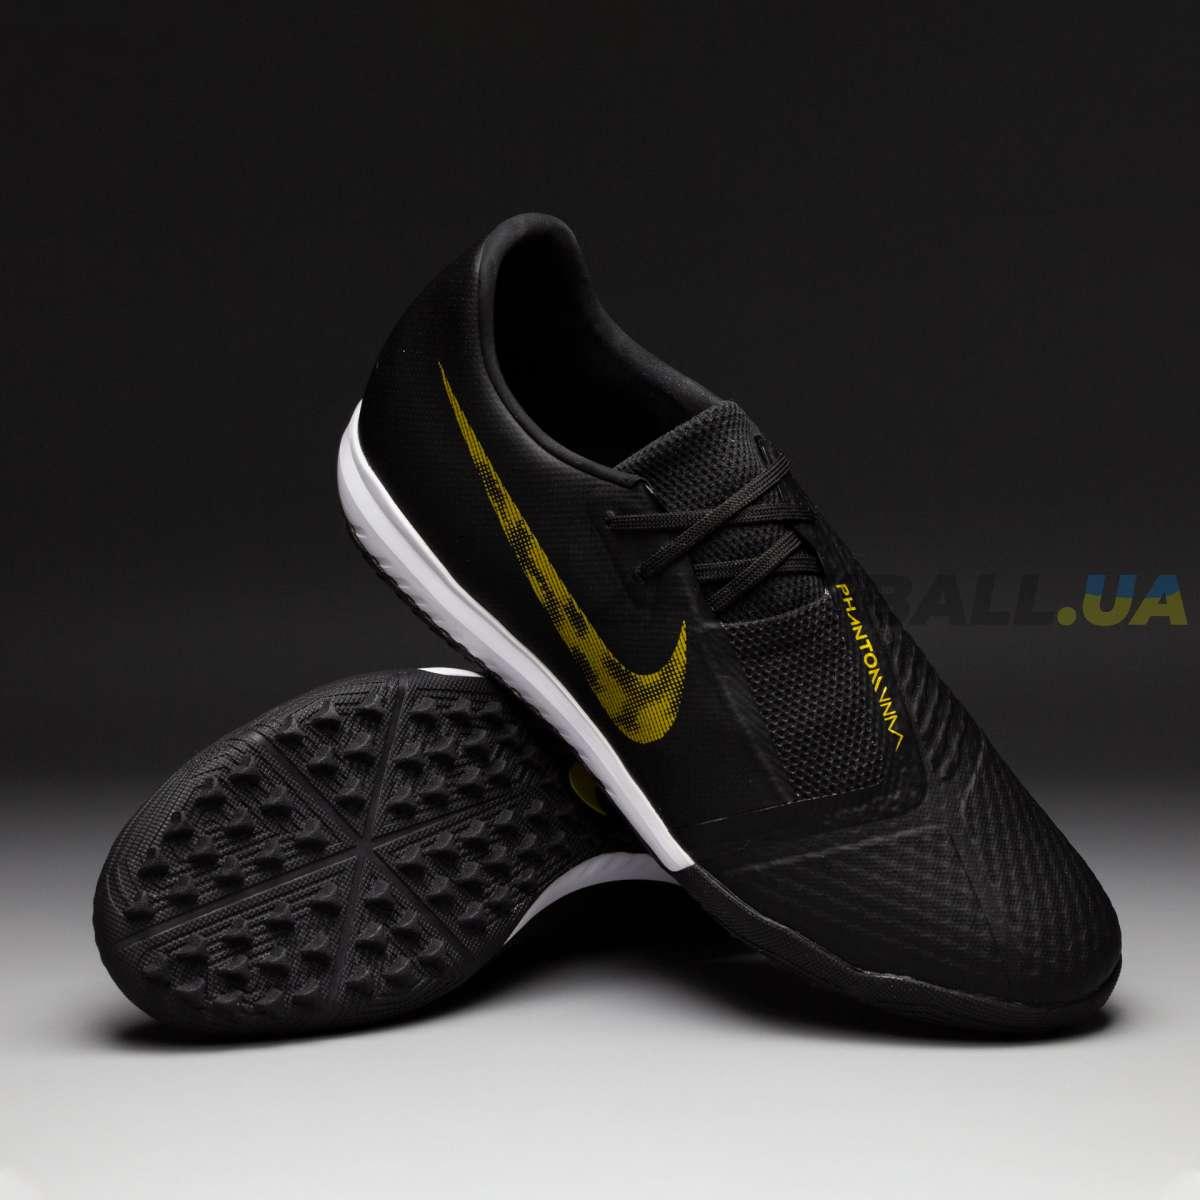 Сороконожки Nike Phantom Venom Academy AO0571-077 990bacd3476a8